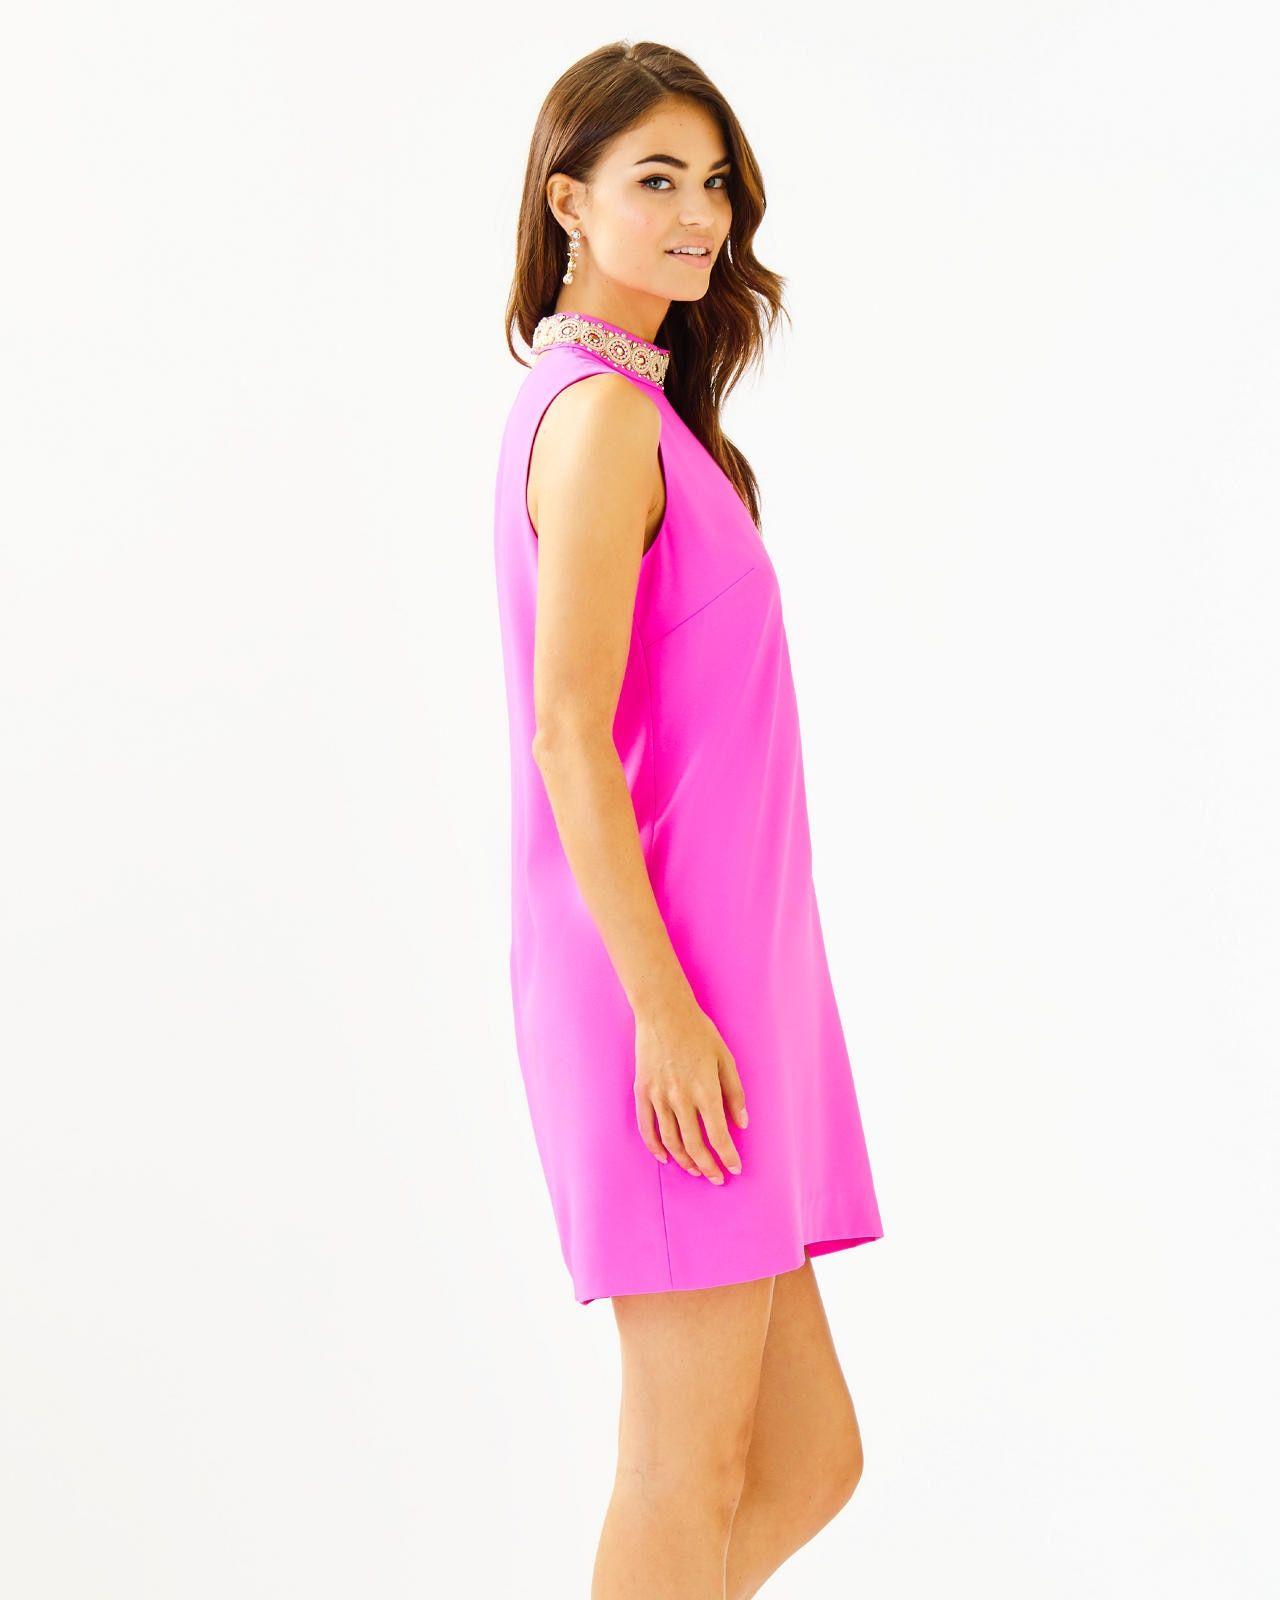 Brandi Beaded Stretch Shift Dress Shift Dress Preppy Dresses Trendy Outfits Inspiration [ 1600 x 1280 Pixel ]